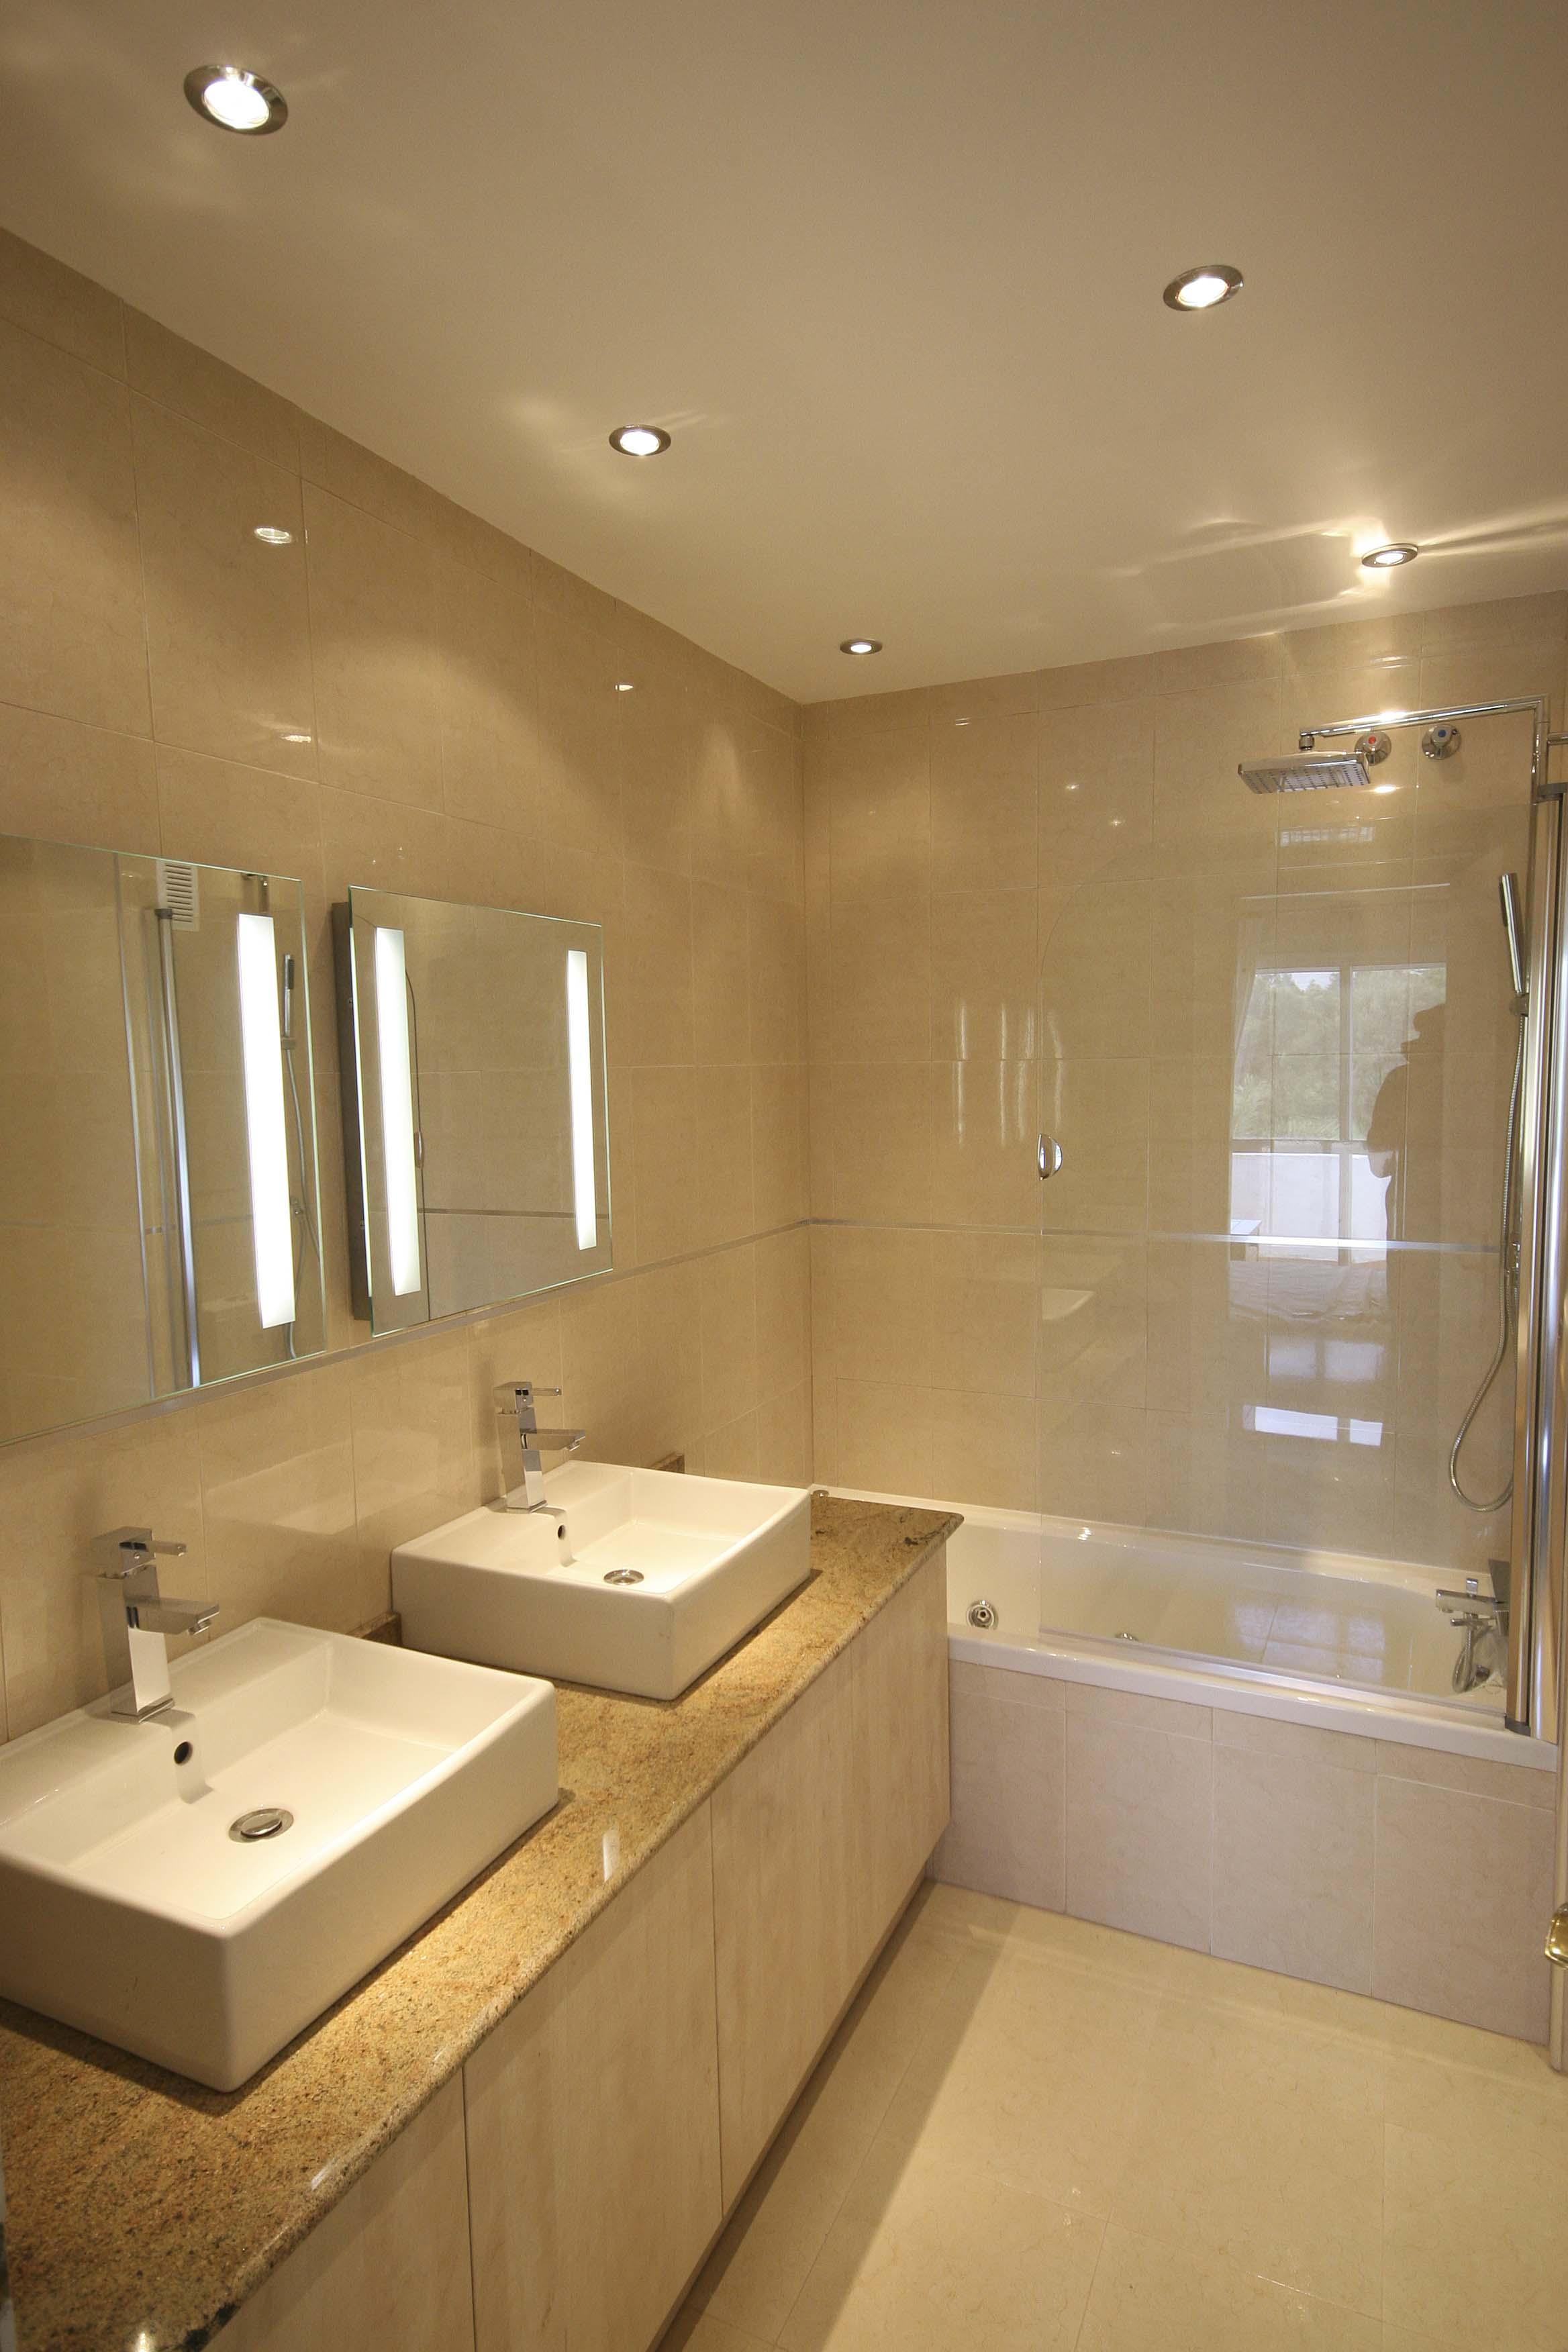 28 Amazing Granite Tiles For Bathroom Floor Ideas And